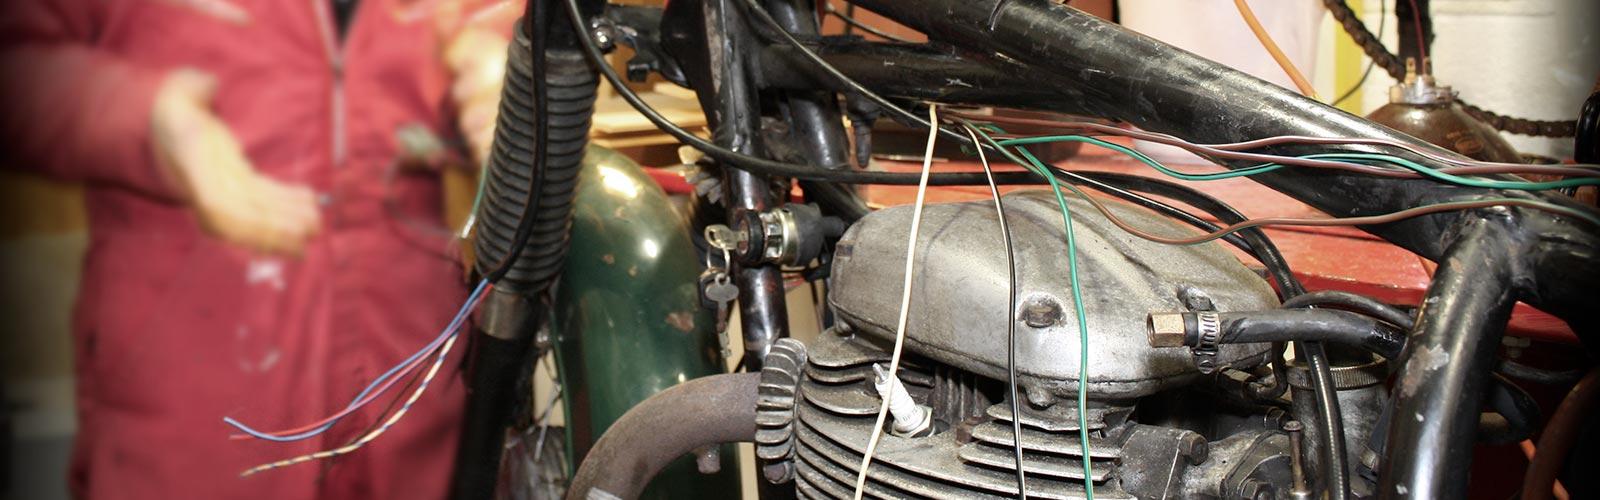 bgBannEngWir faq custom motorcycle wiring loom  at honlapkeszites.co